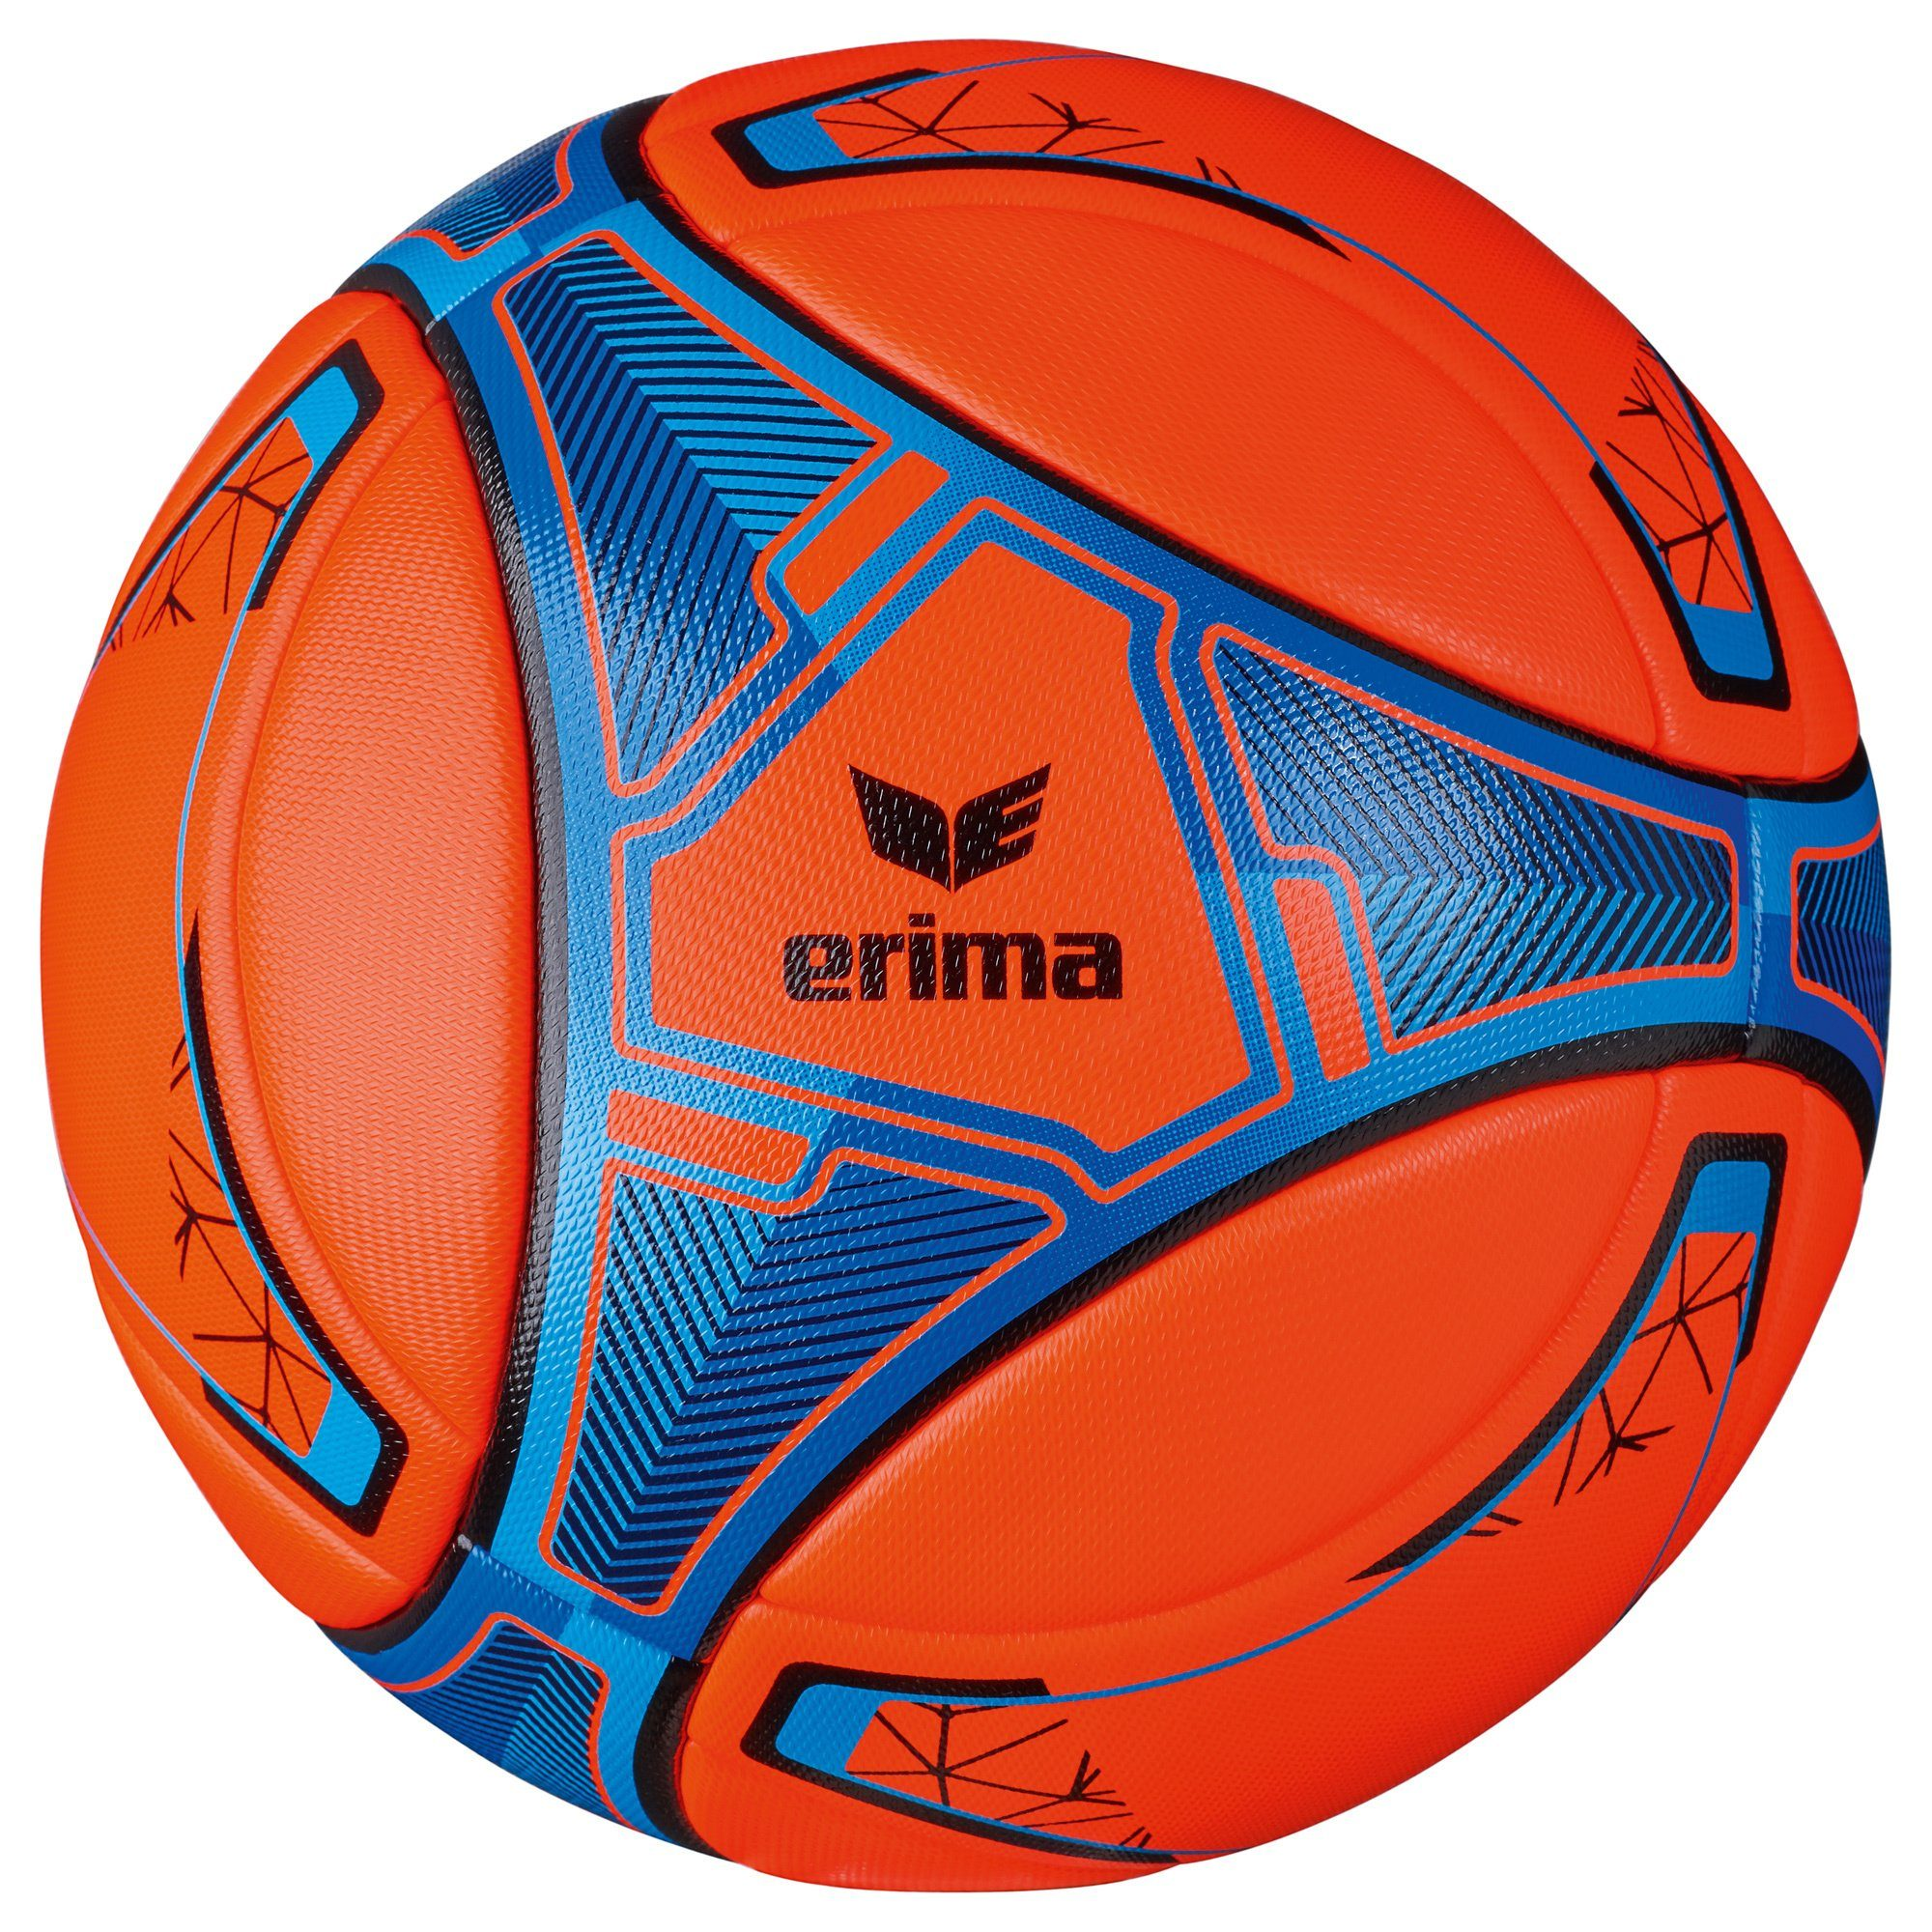 ERIMA Senzor Match Evo Snow Fußball